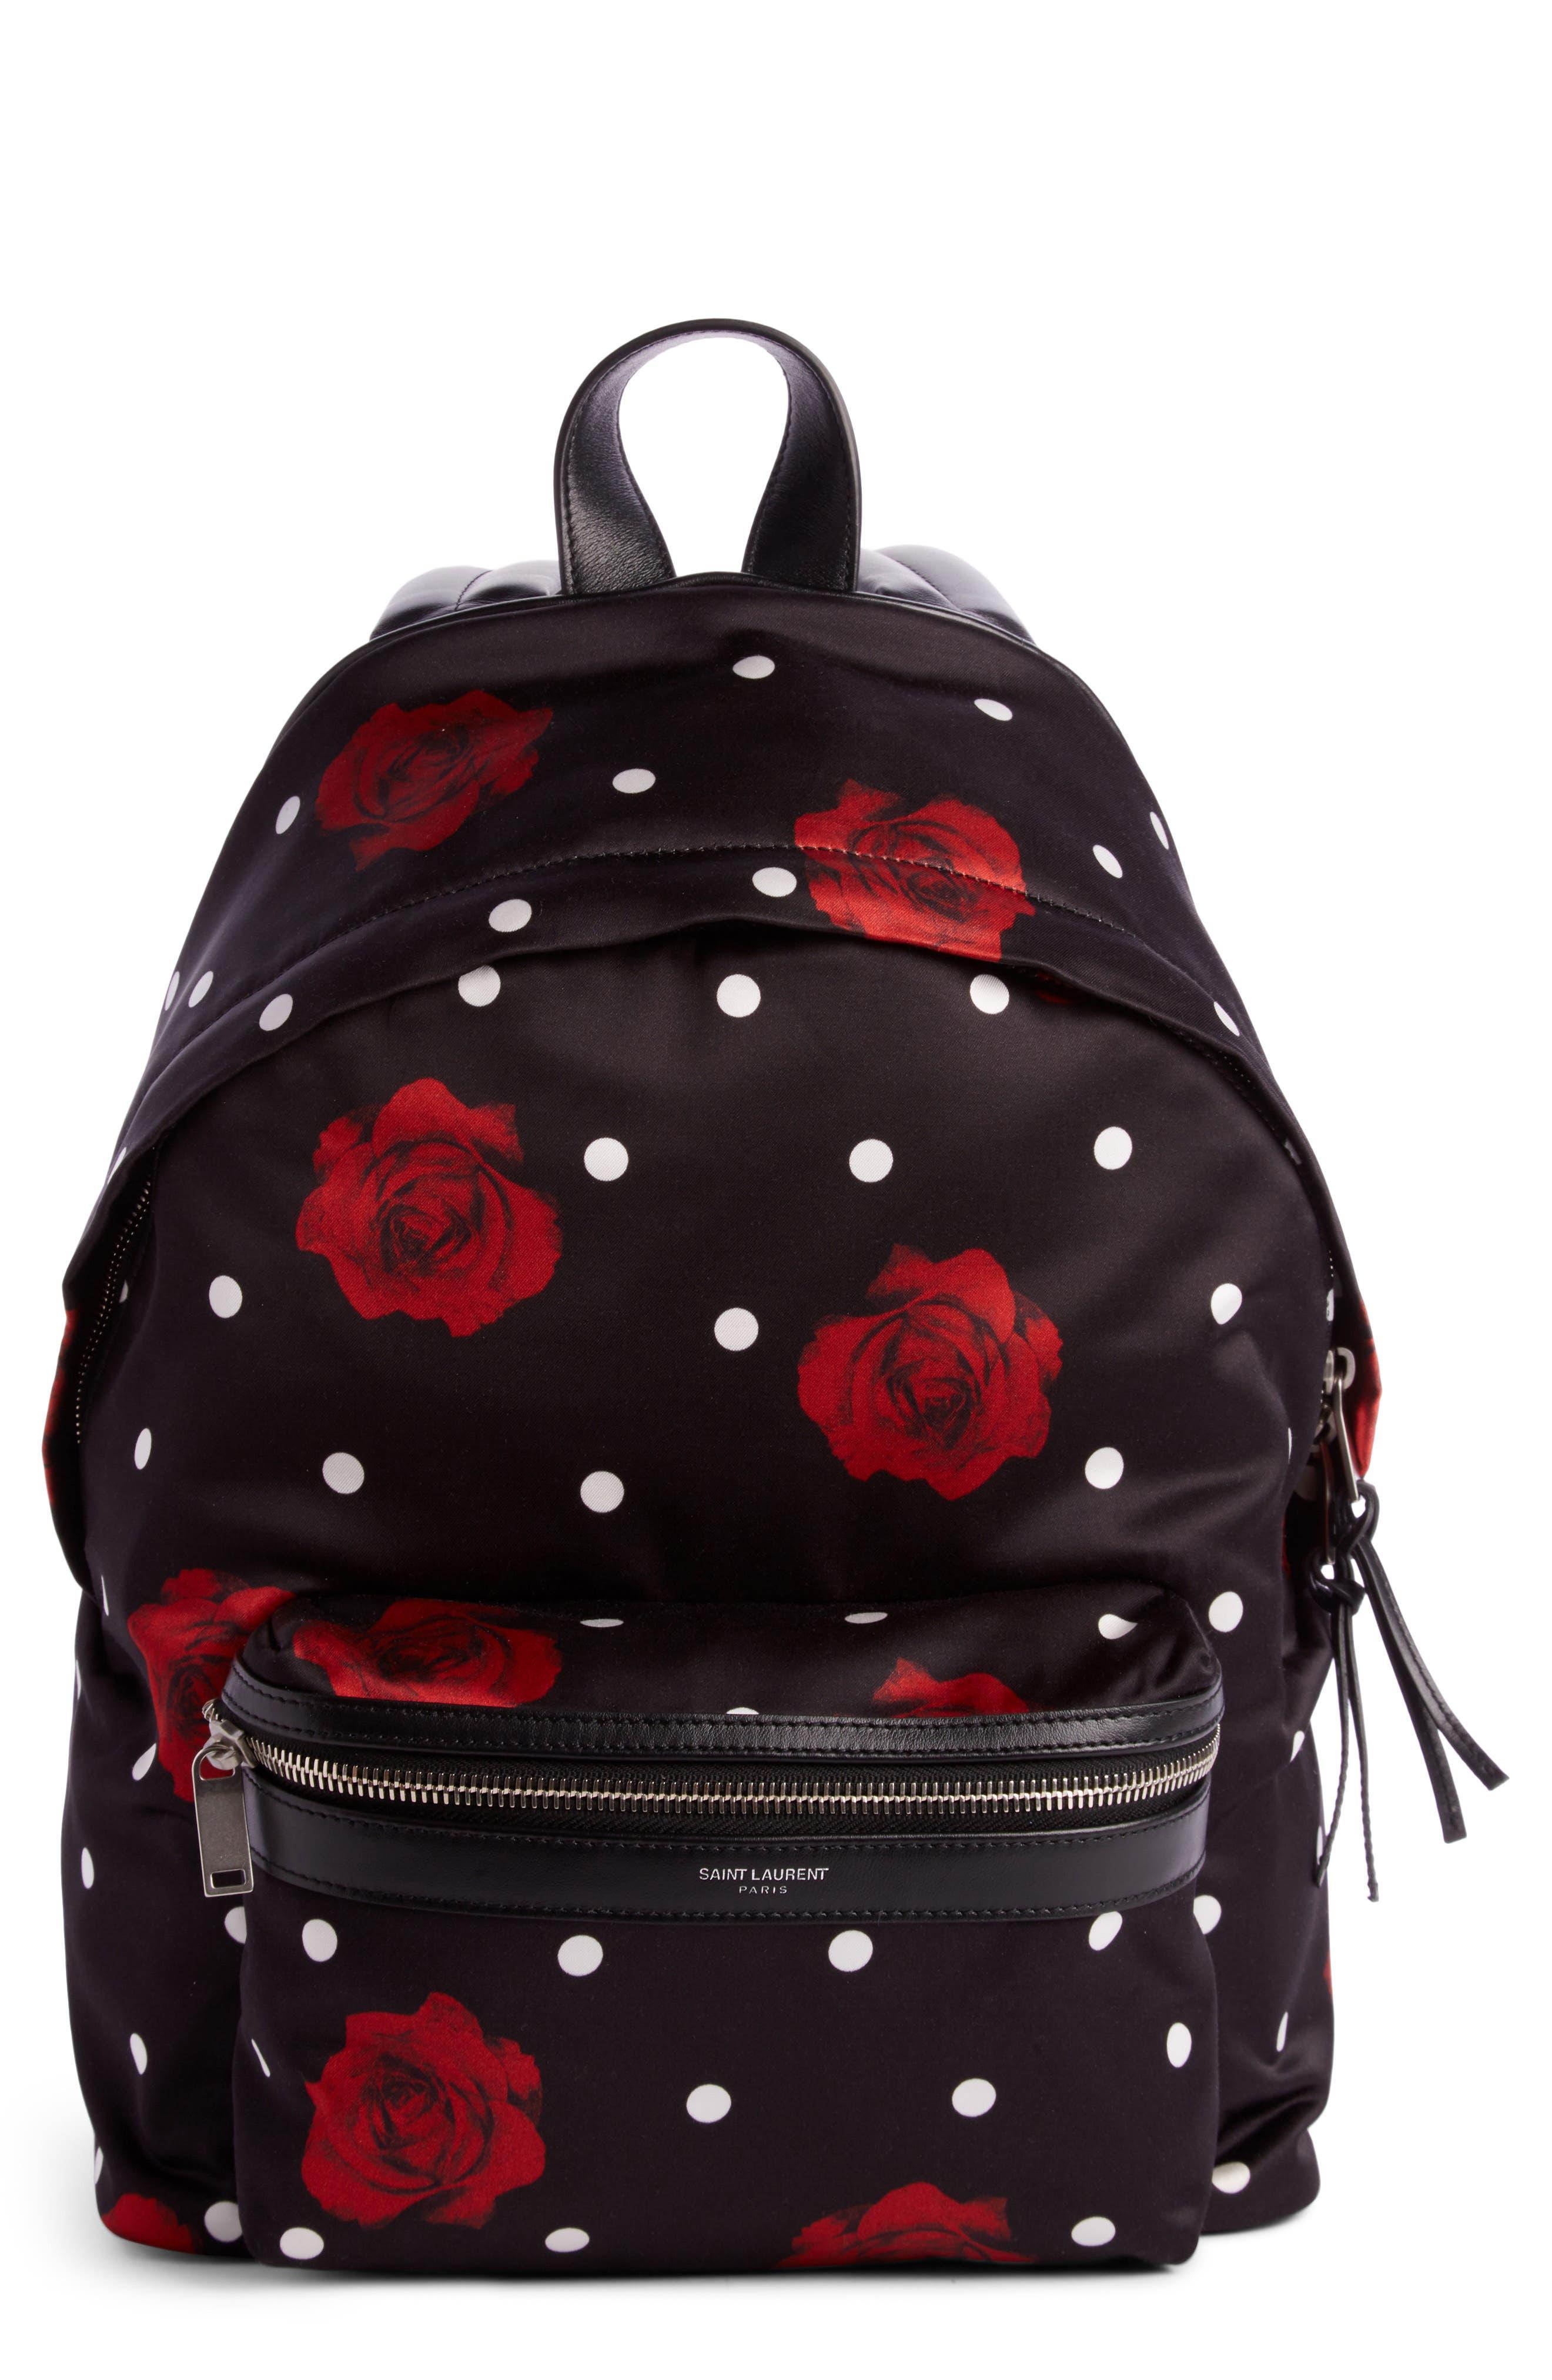 Saint Laurent City Mini Rose Print Satin Backpack